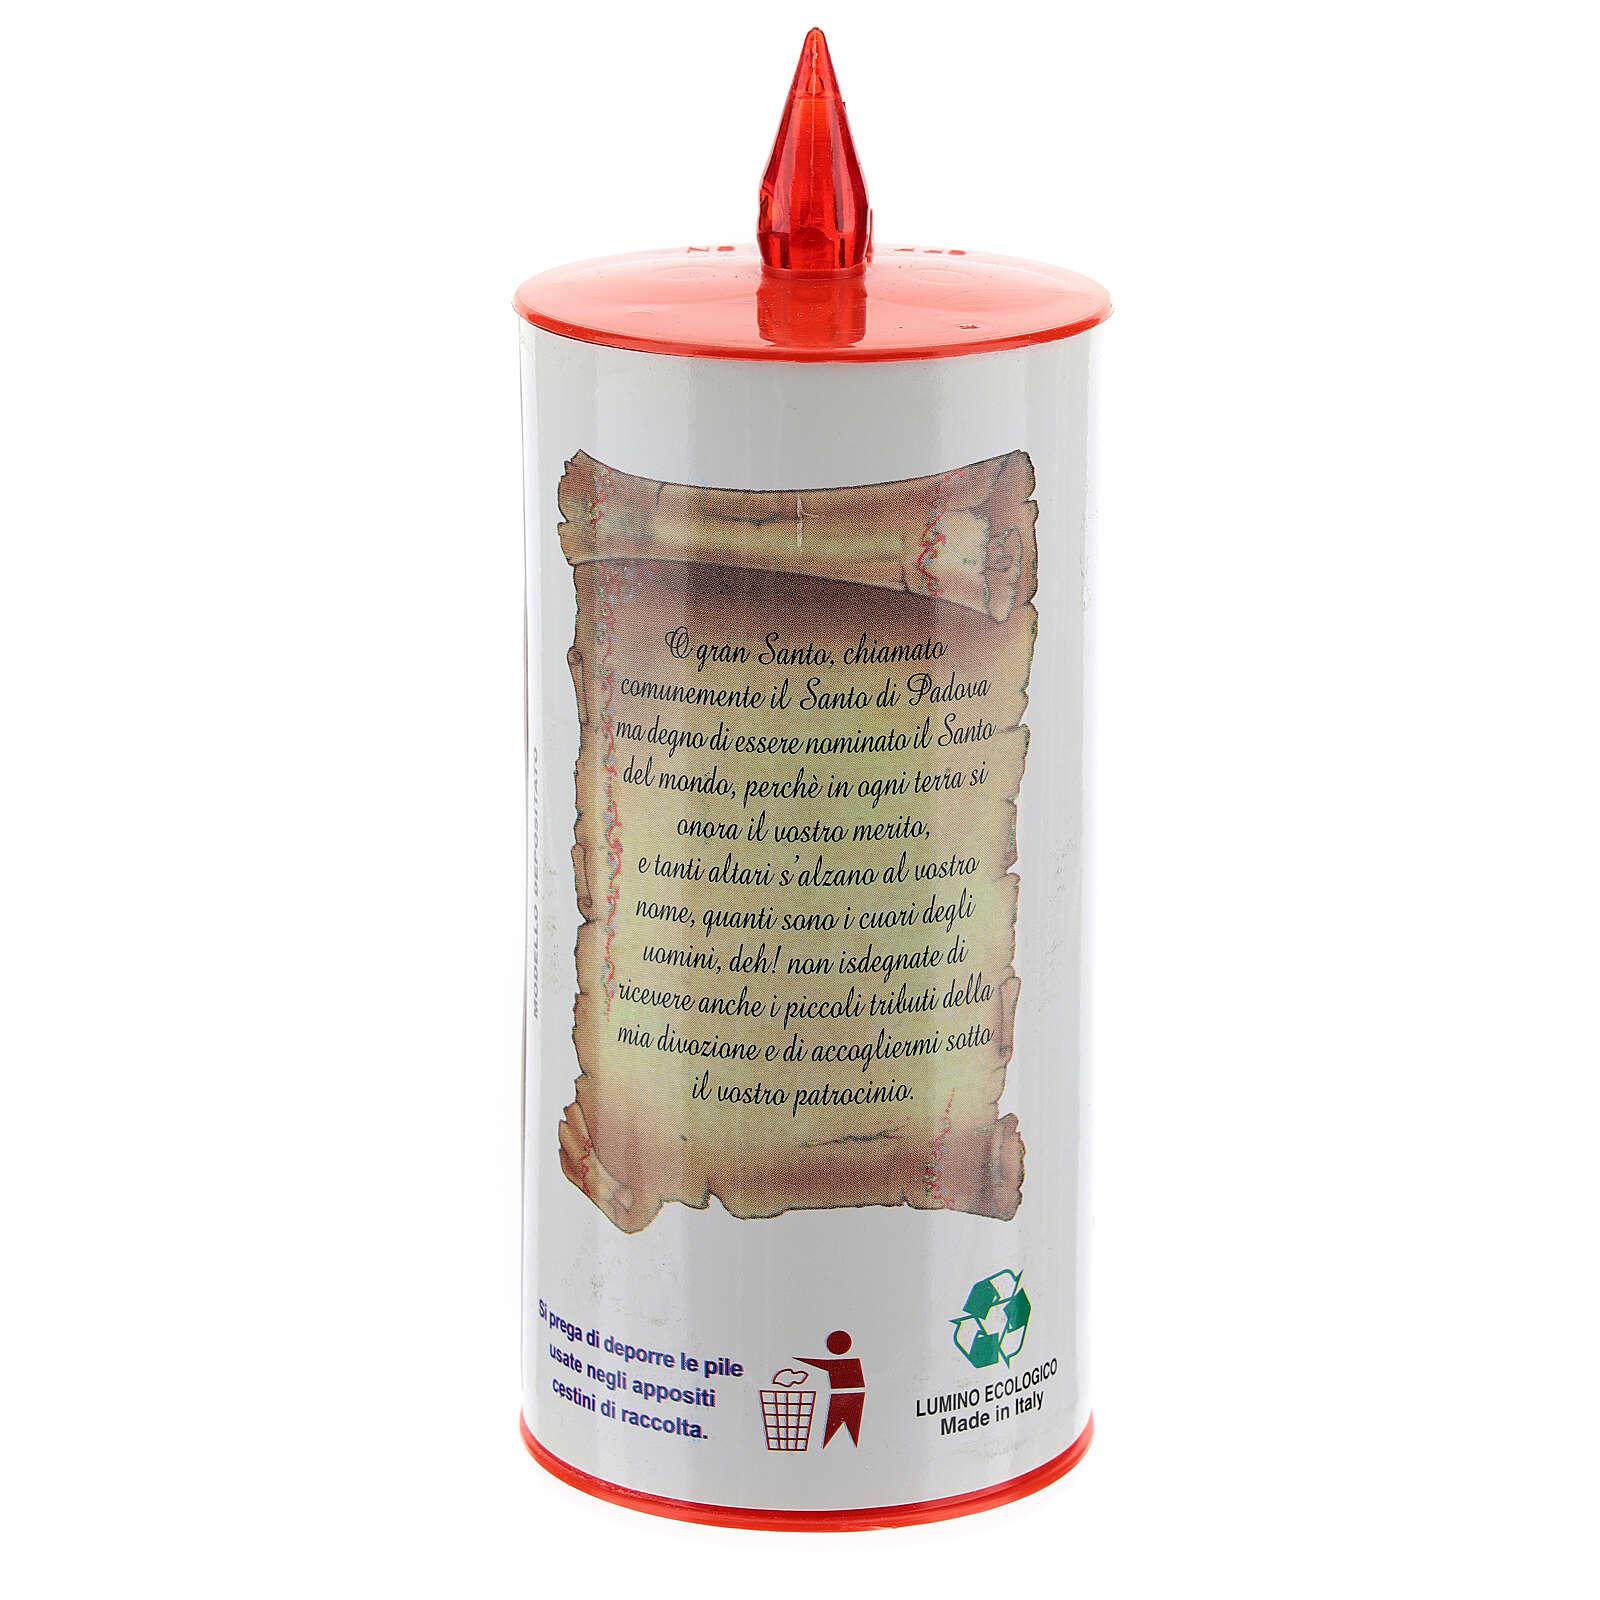 LED votive candle, white cardboard with image, lasting 70 days 3